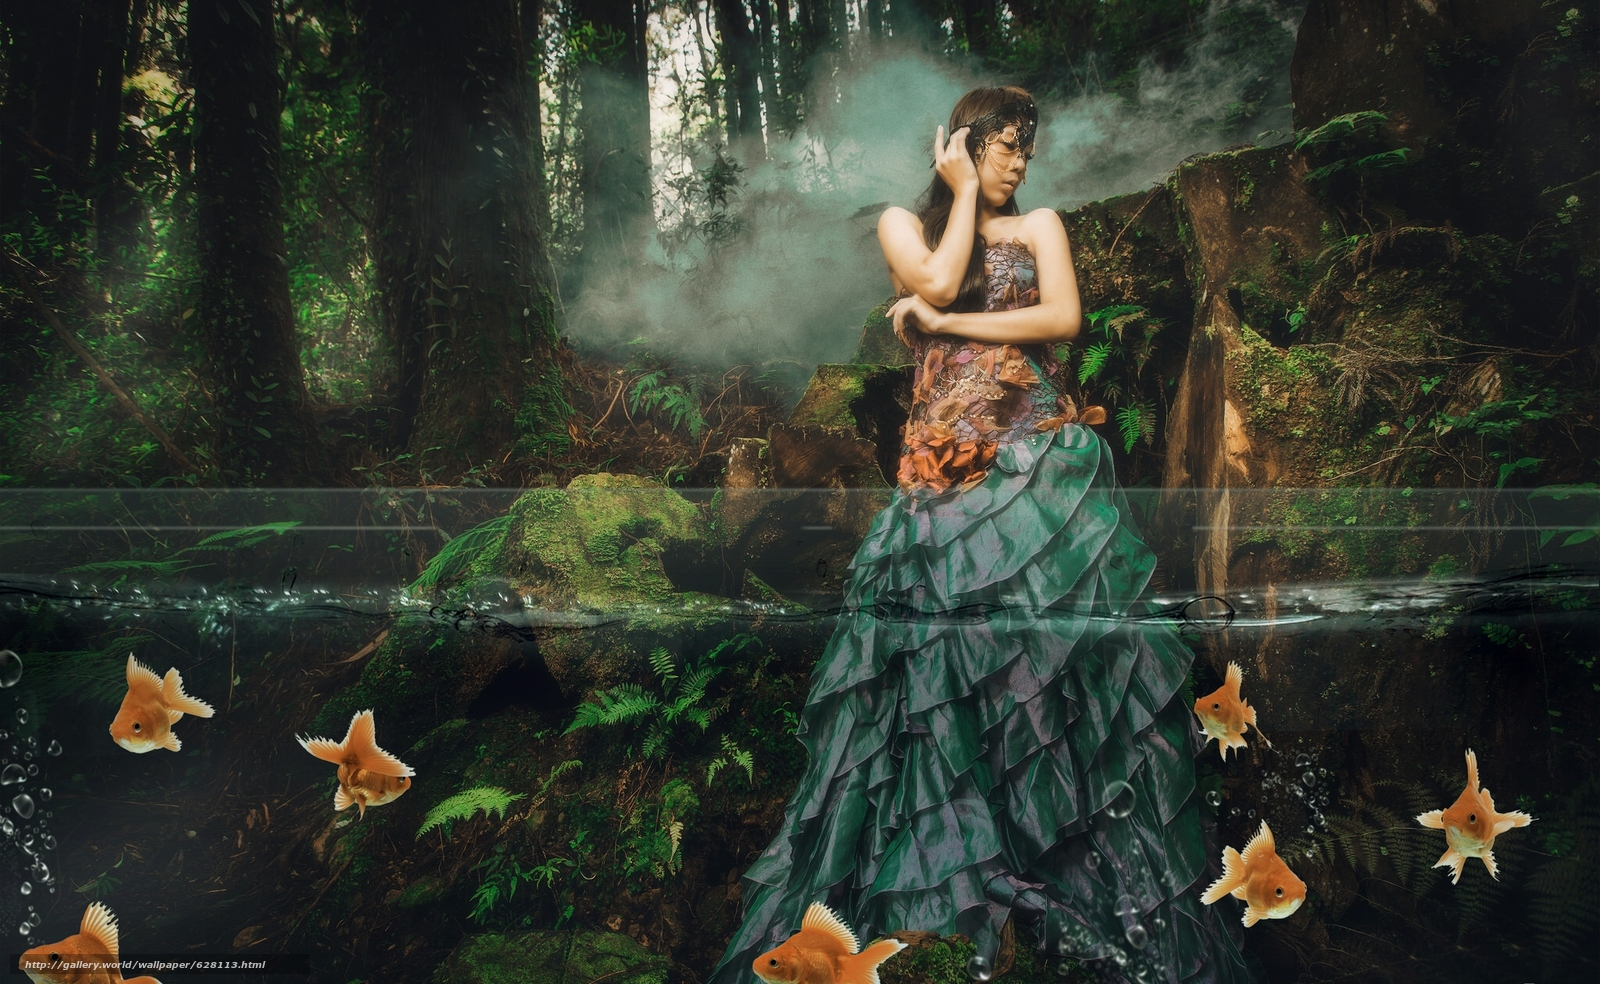 Скачать на телефон обои фото картинку на тему девушка, азиатка, платье, рыбки, вода, лес, ситуация, разширение 2048x1260